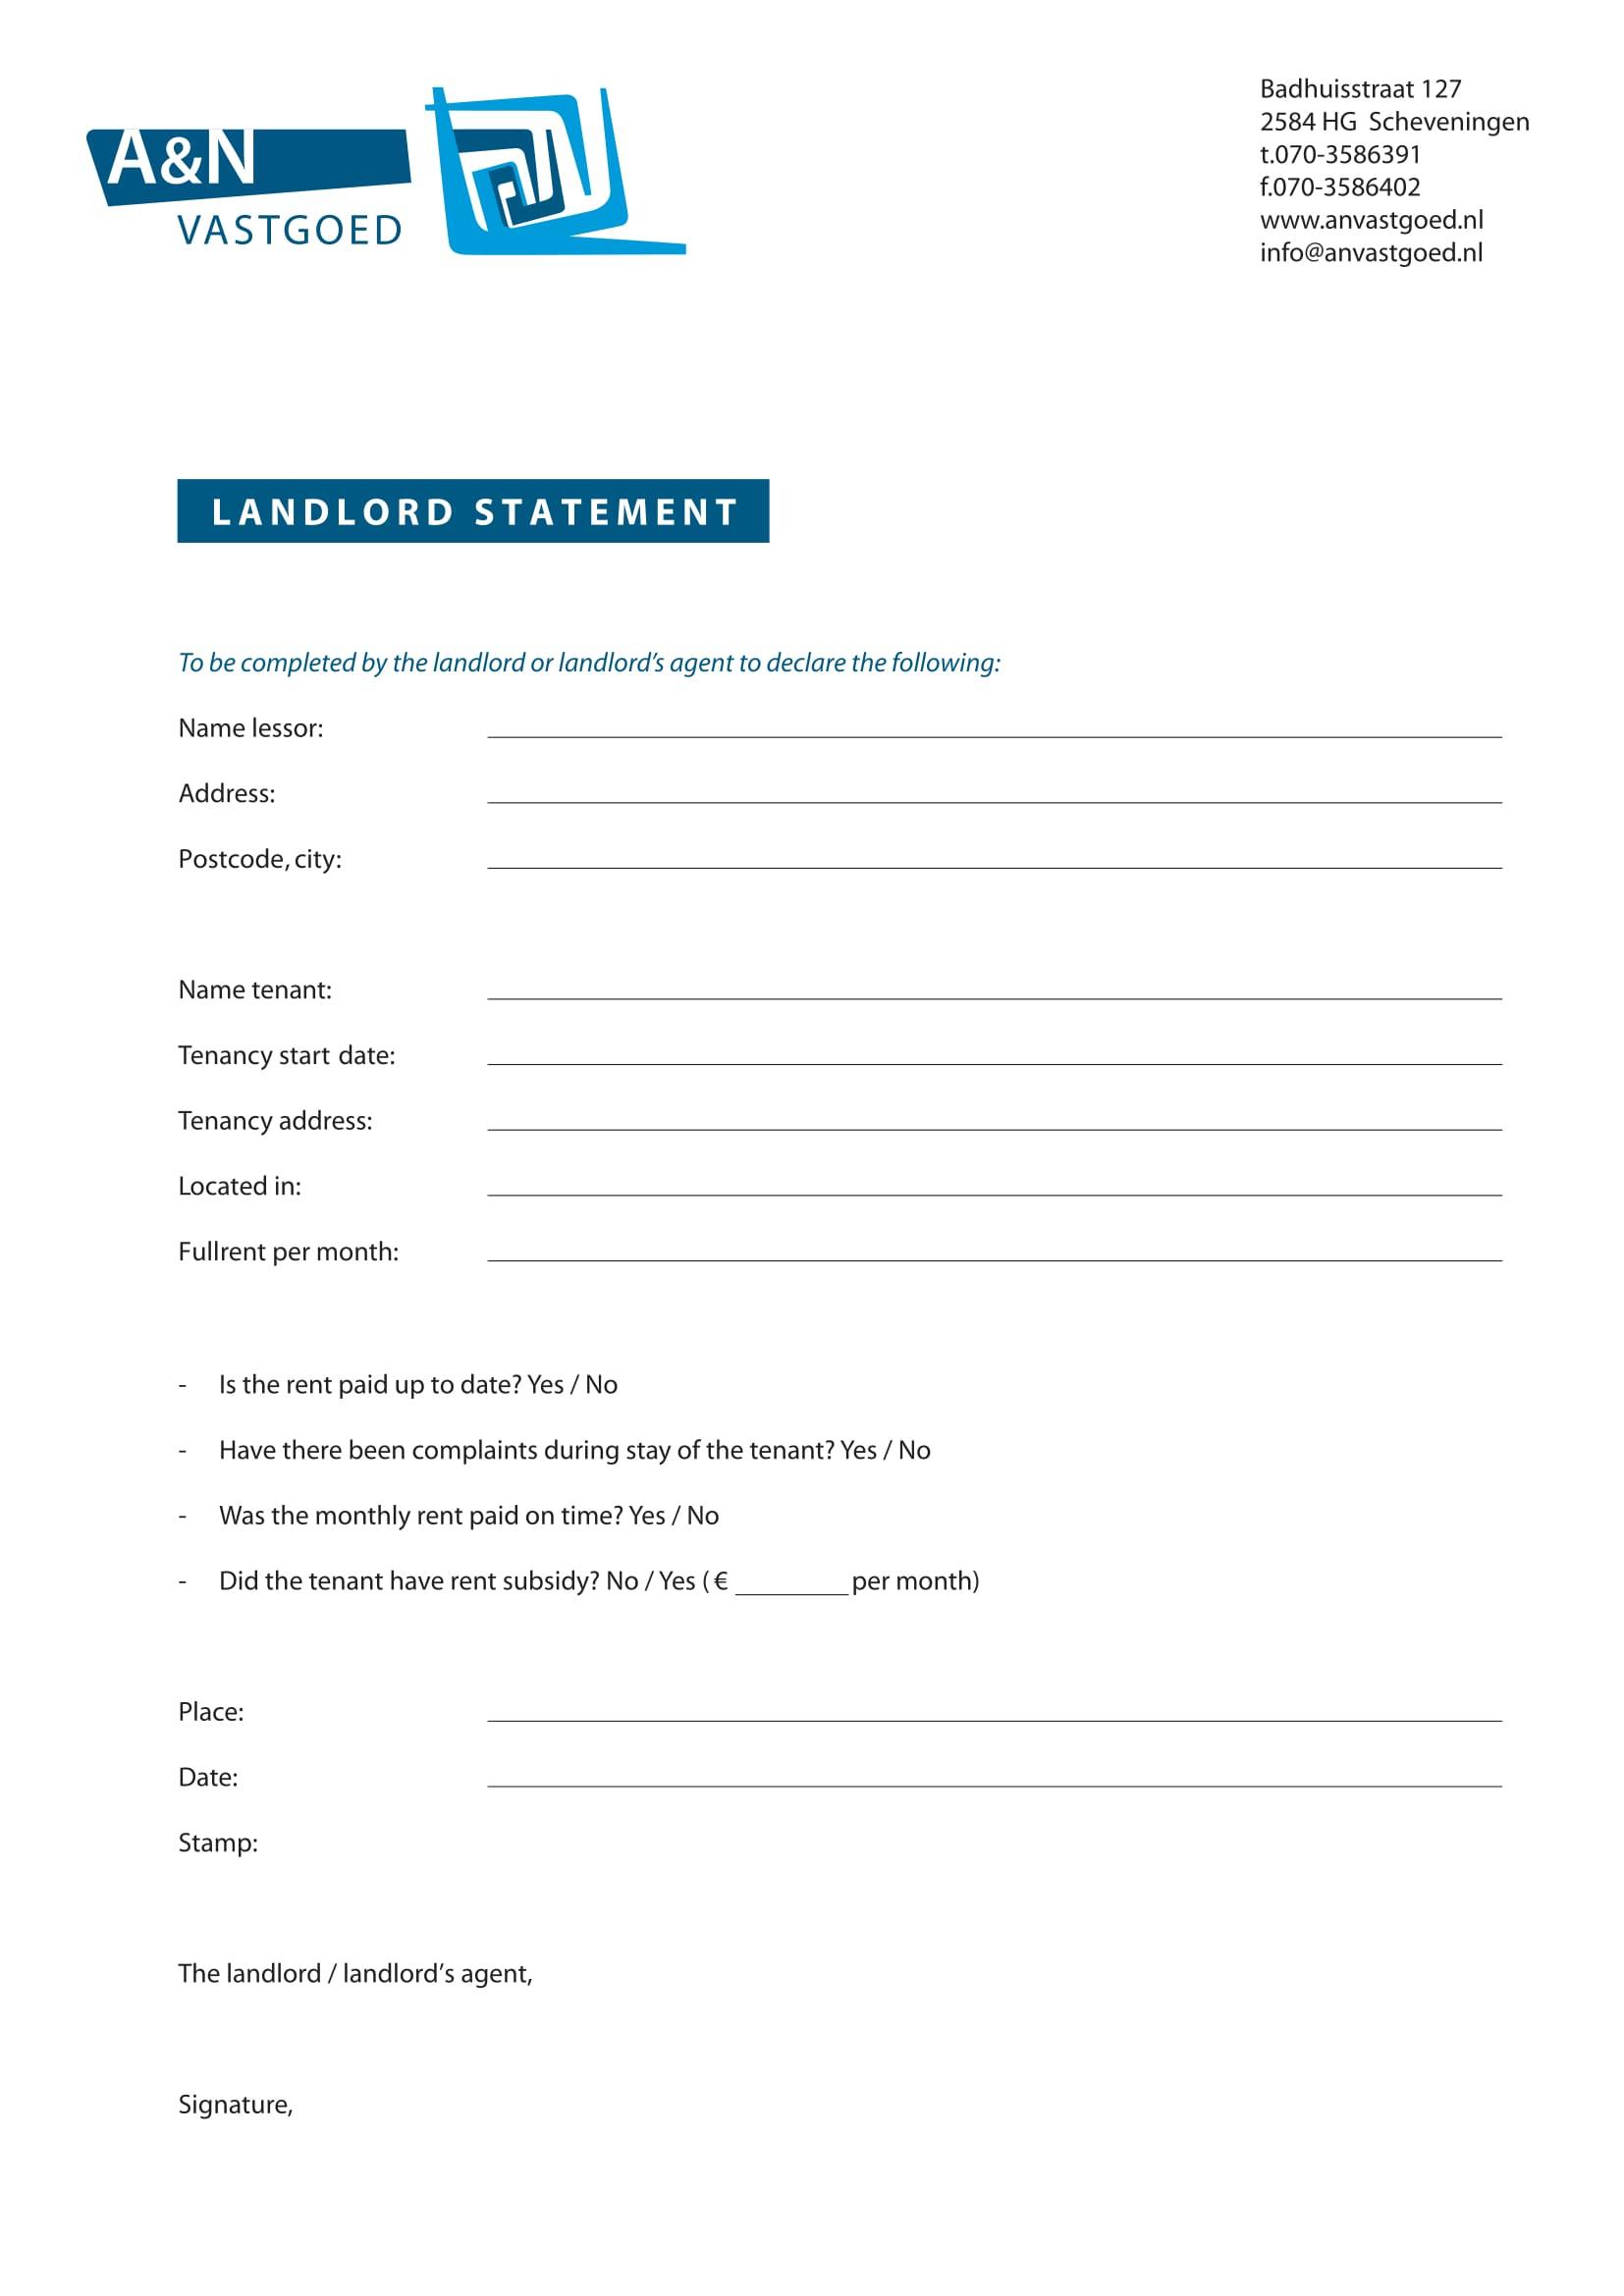 landlord statement form sample 1